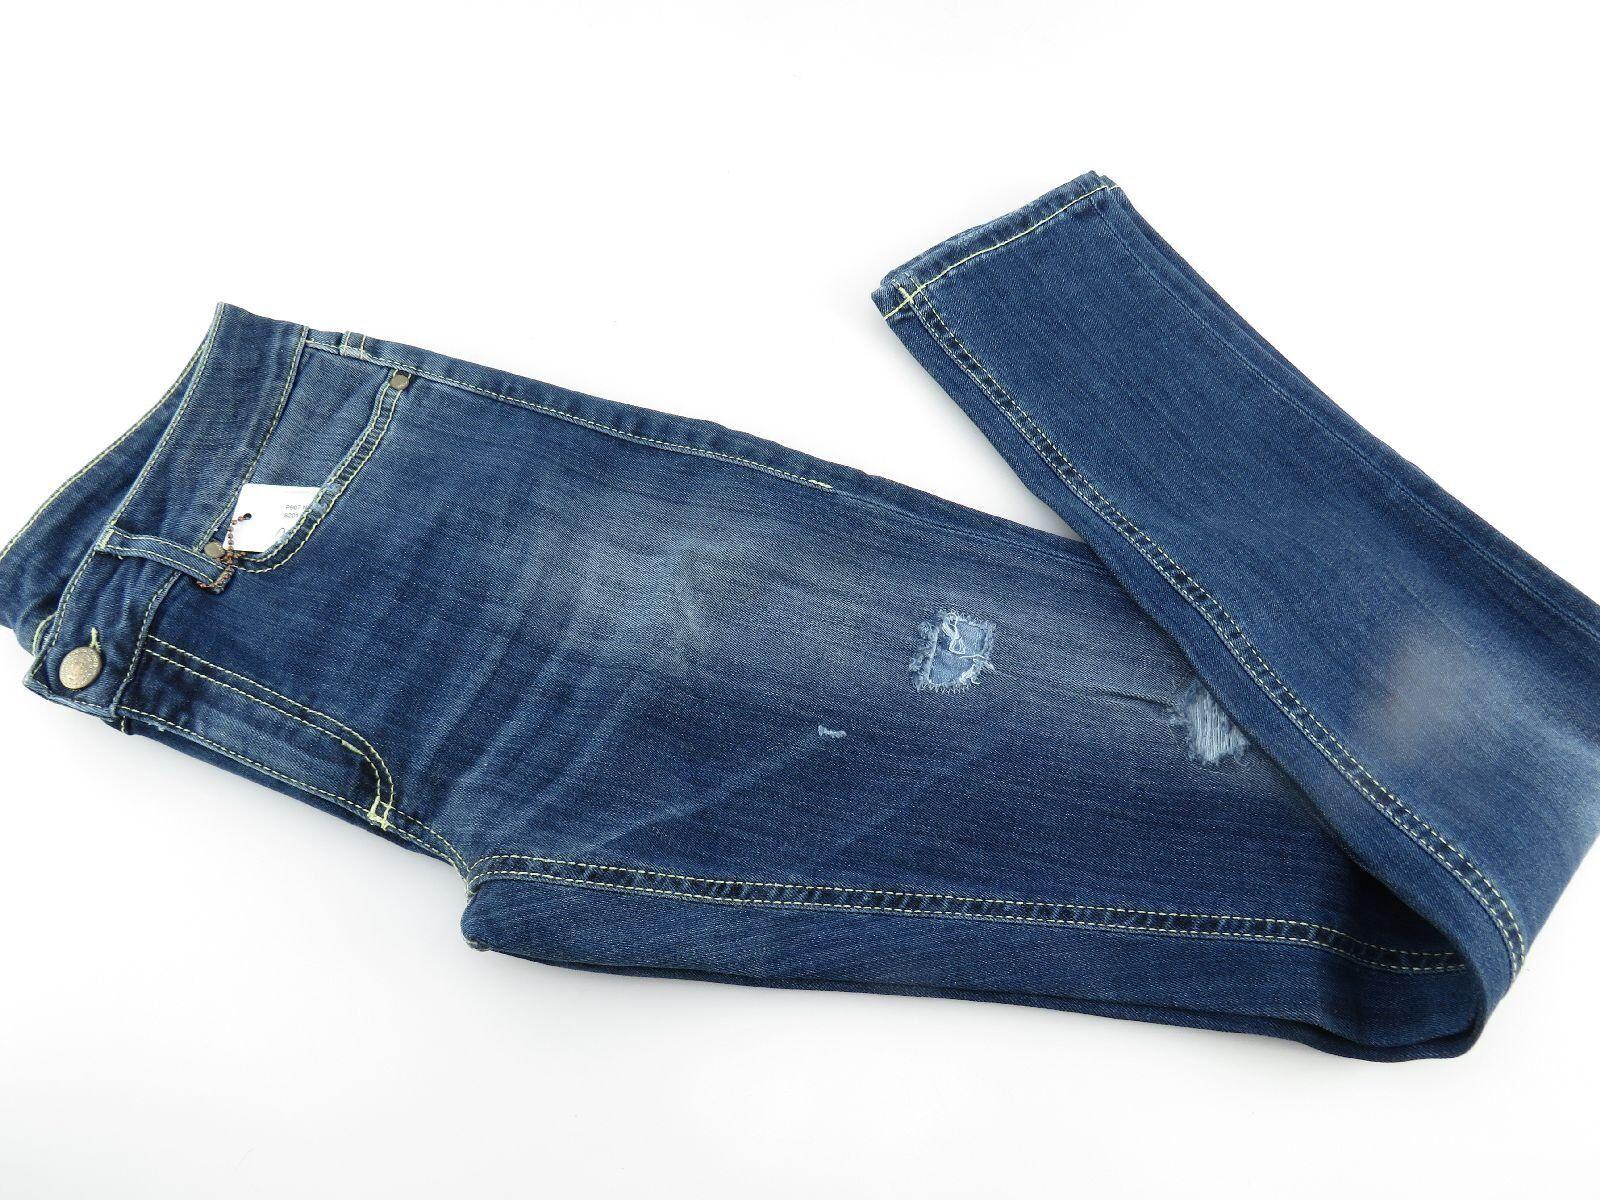 DONDUP Damen Jeans Used look Strech Denim blau P907 NEU ehemaliger  249 - EUR